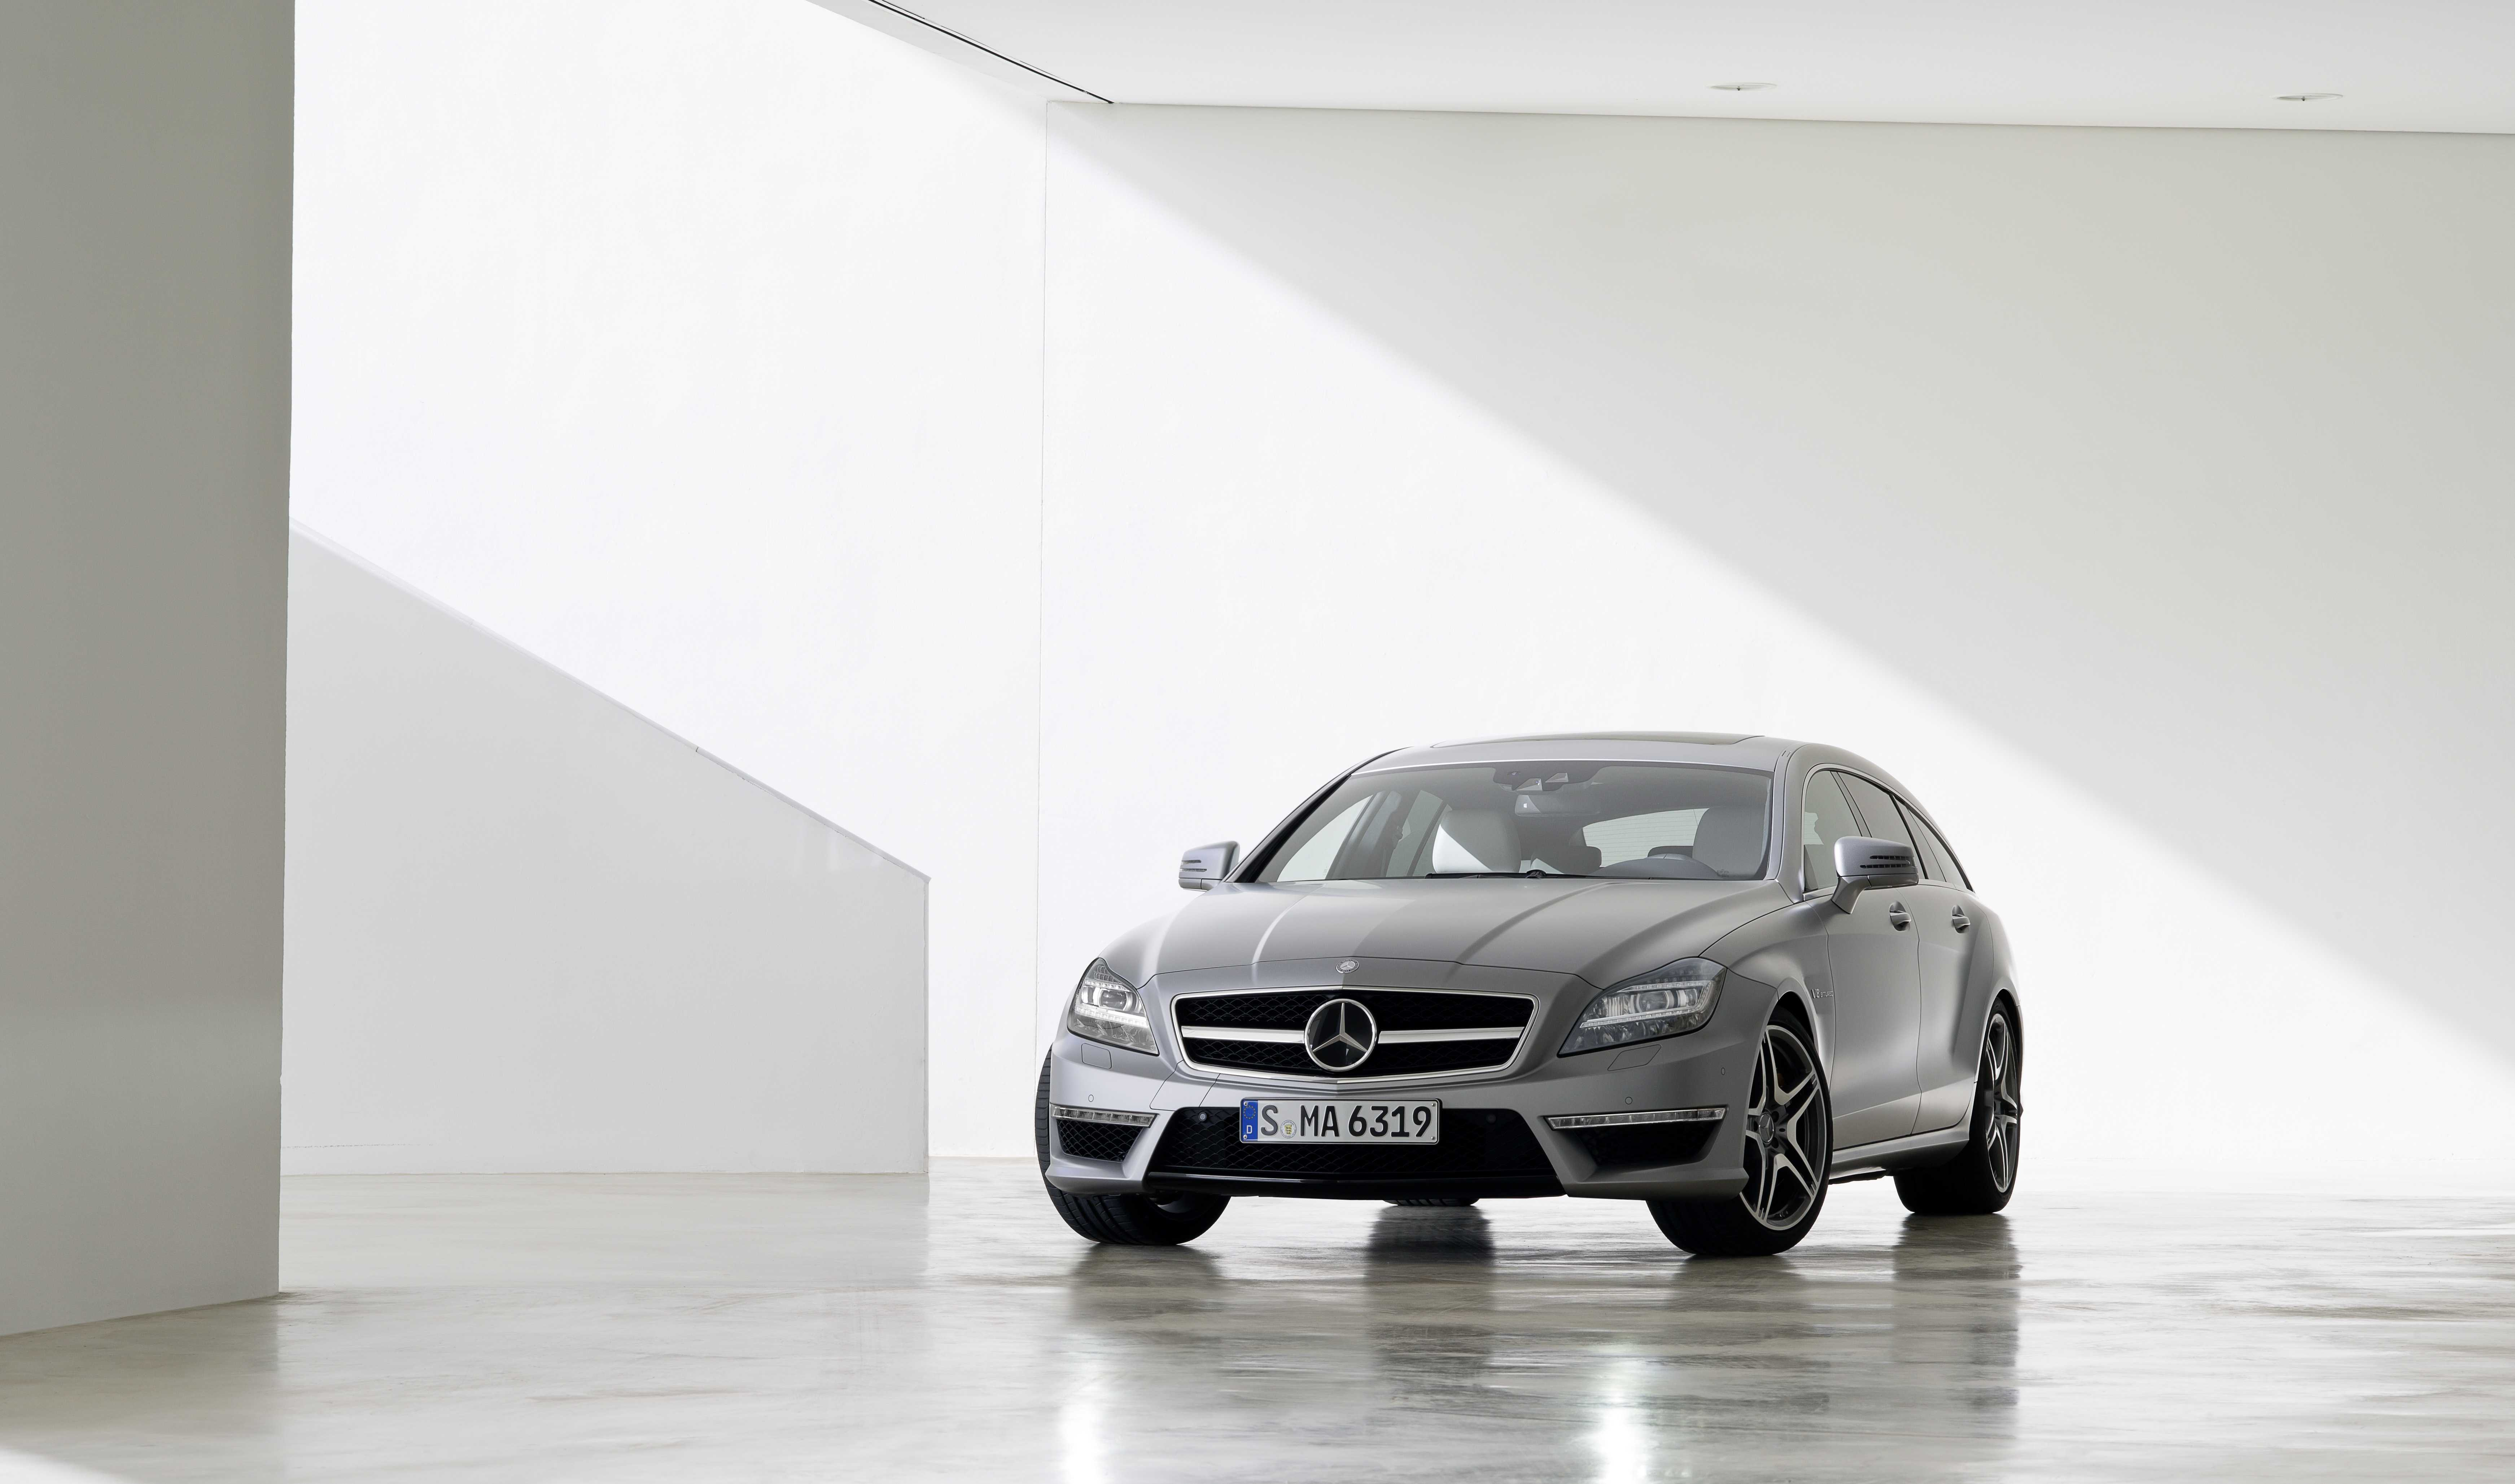 Mercedes Benz CLS 63 AMG Shooting Brake 525hp 2013